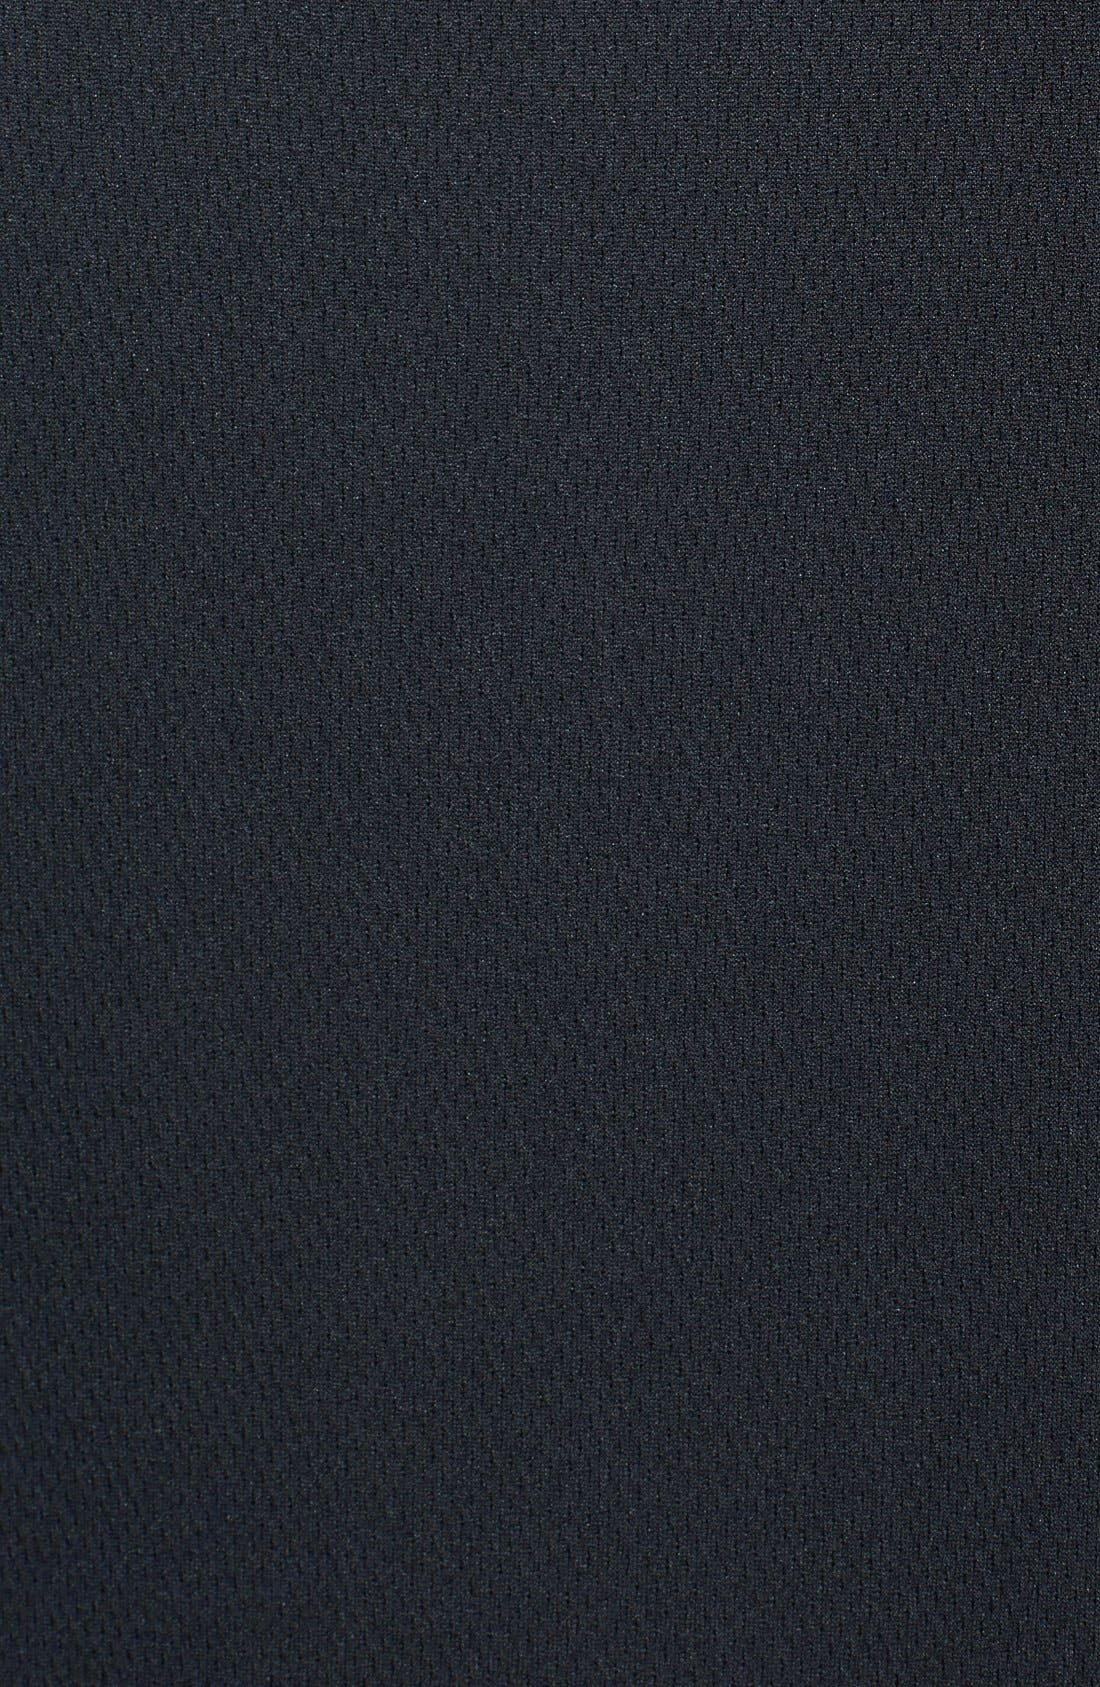 Washington DC NFL Team - Edge DryTec Moisture Wicking Half Zip Pullover,                             Alternate thumbnail 3, color,